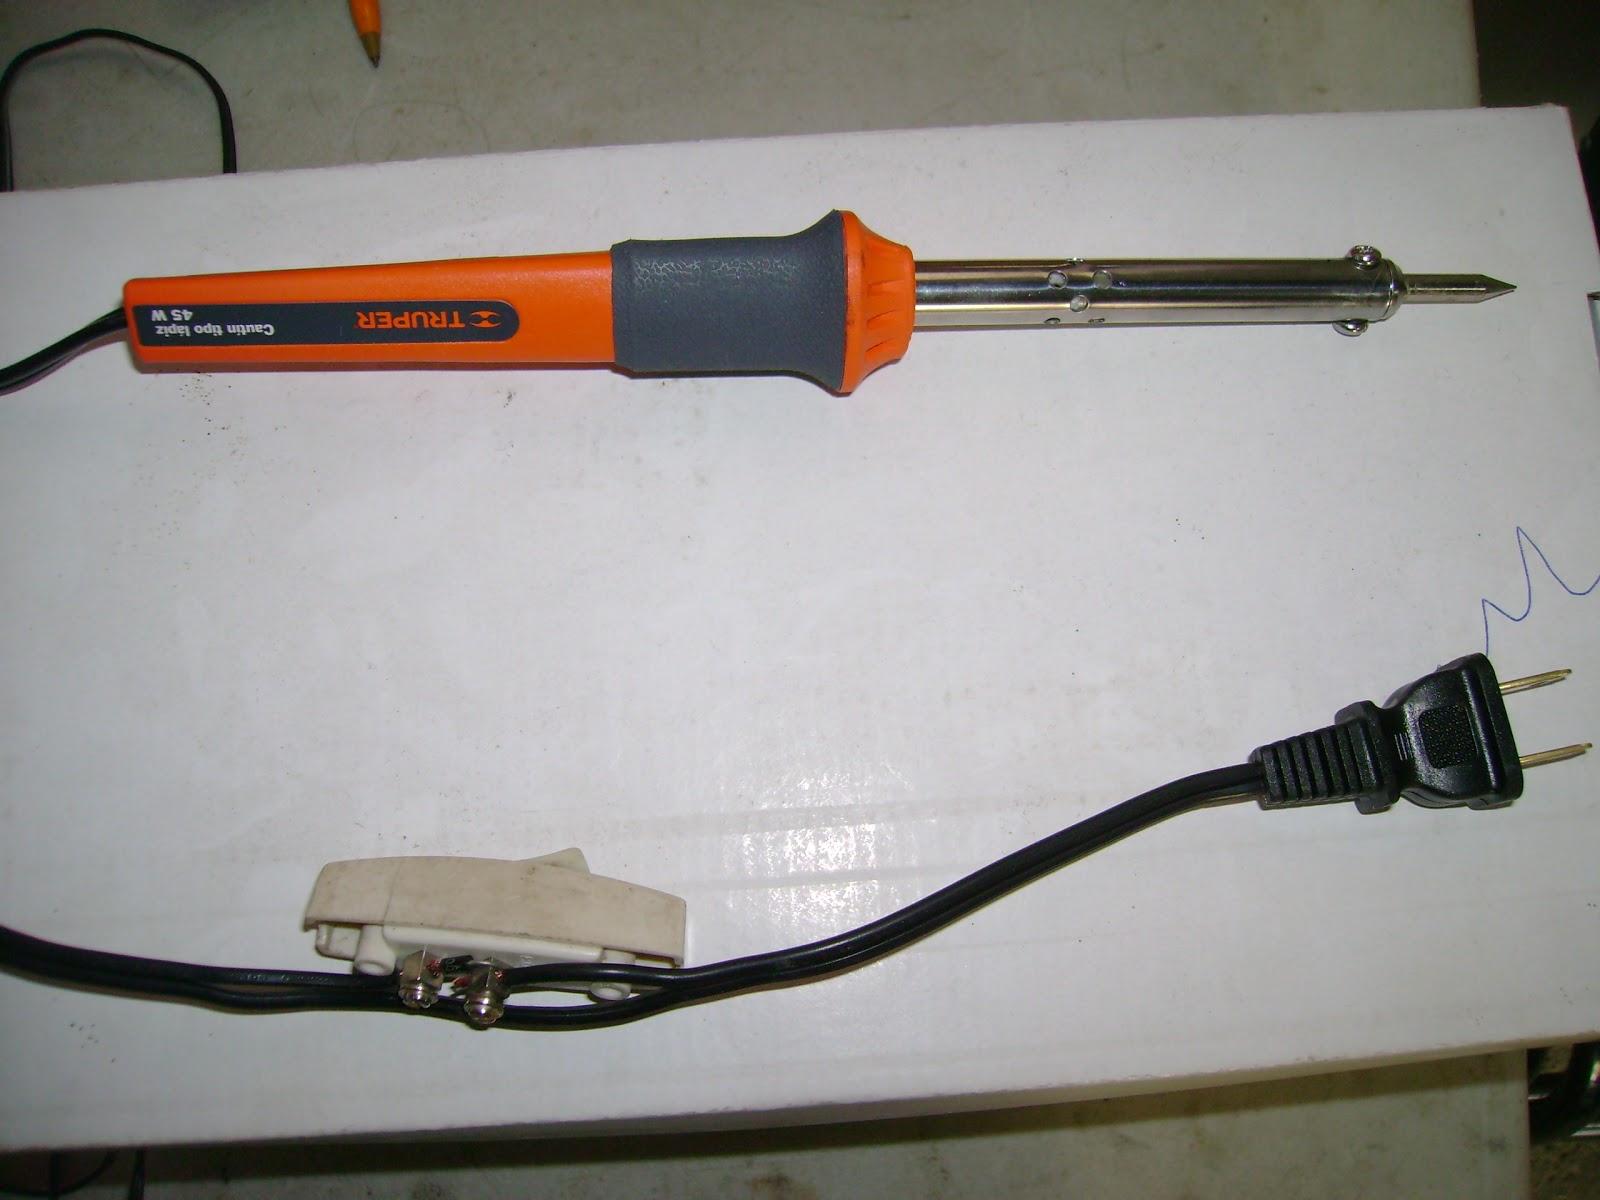 EDIS CORNER: Tips and Tricks pencil-type soldering iron